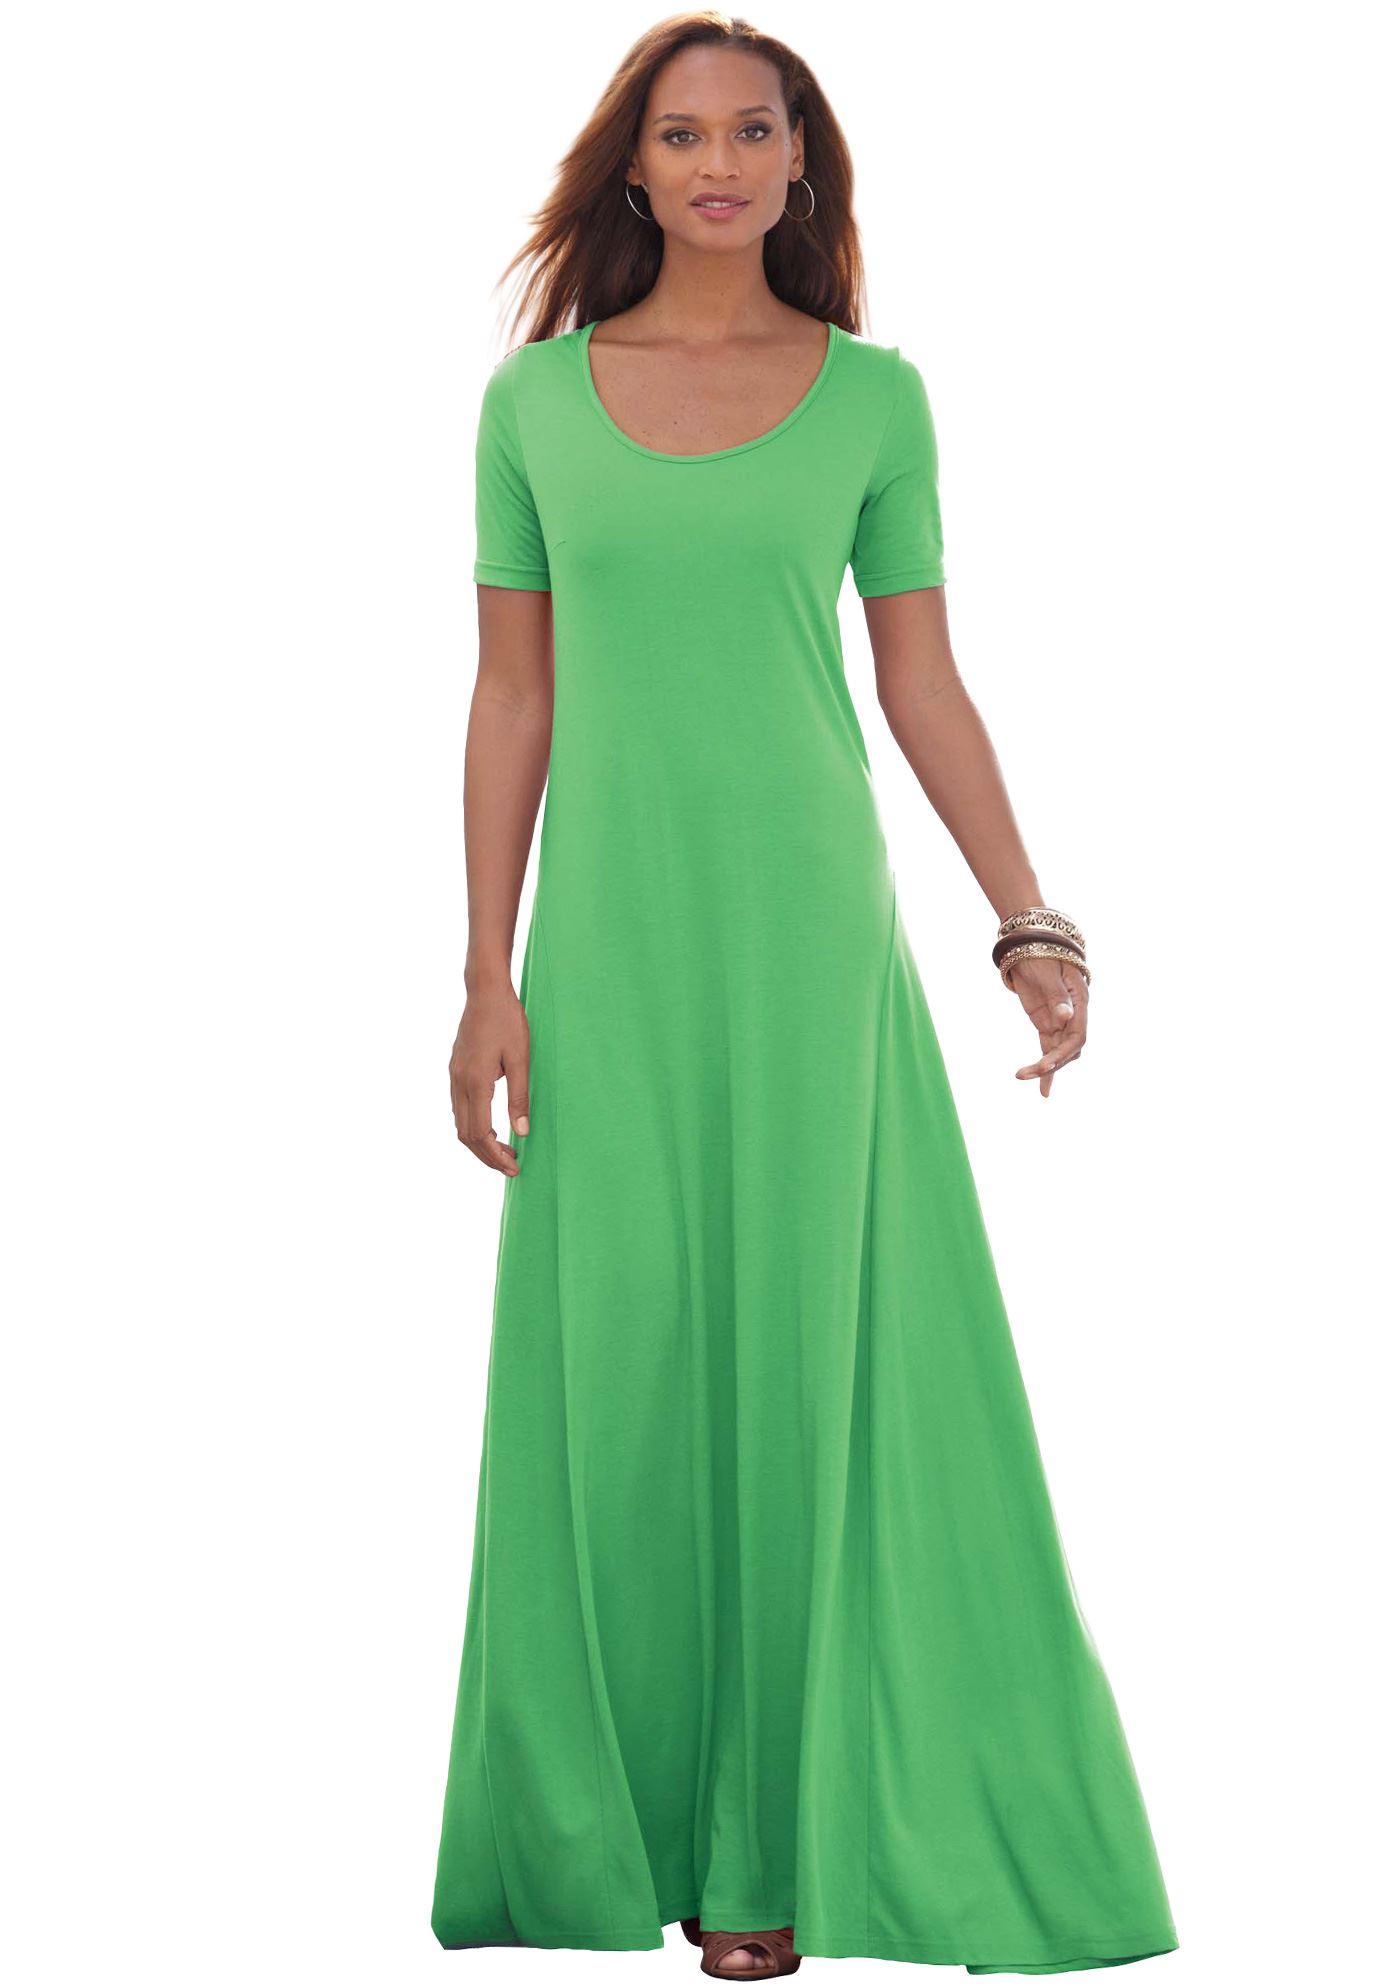 Tee Shirt Maxi Dress Plus Size Casual Dresses Full Beauty